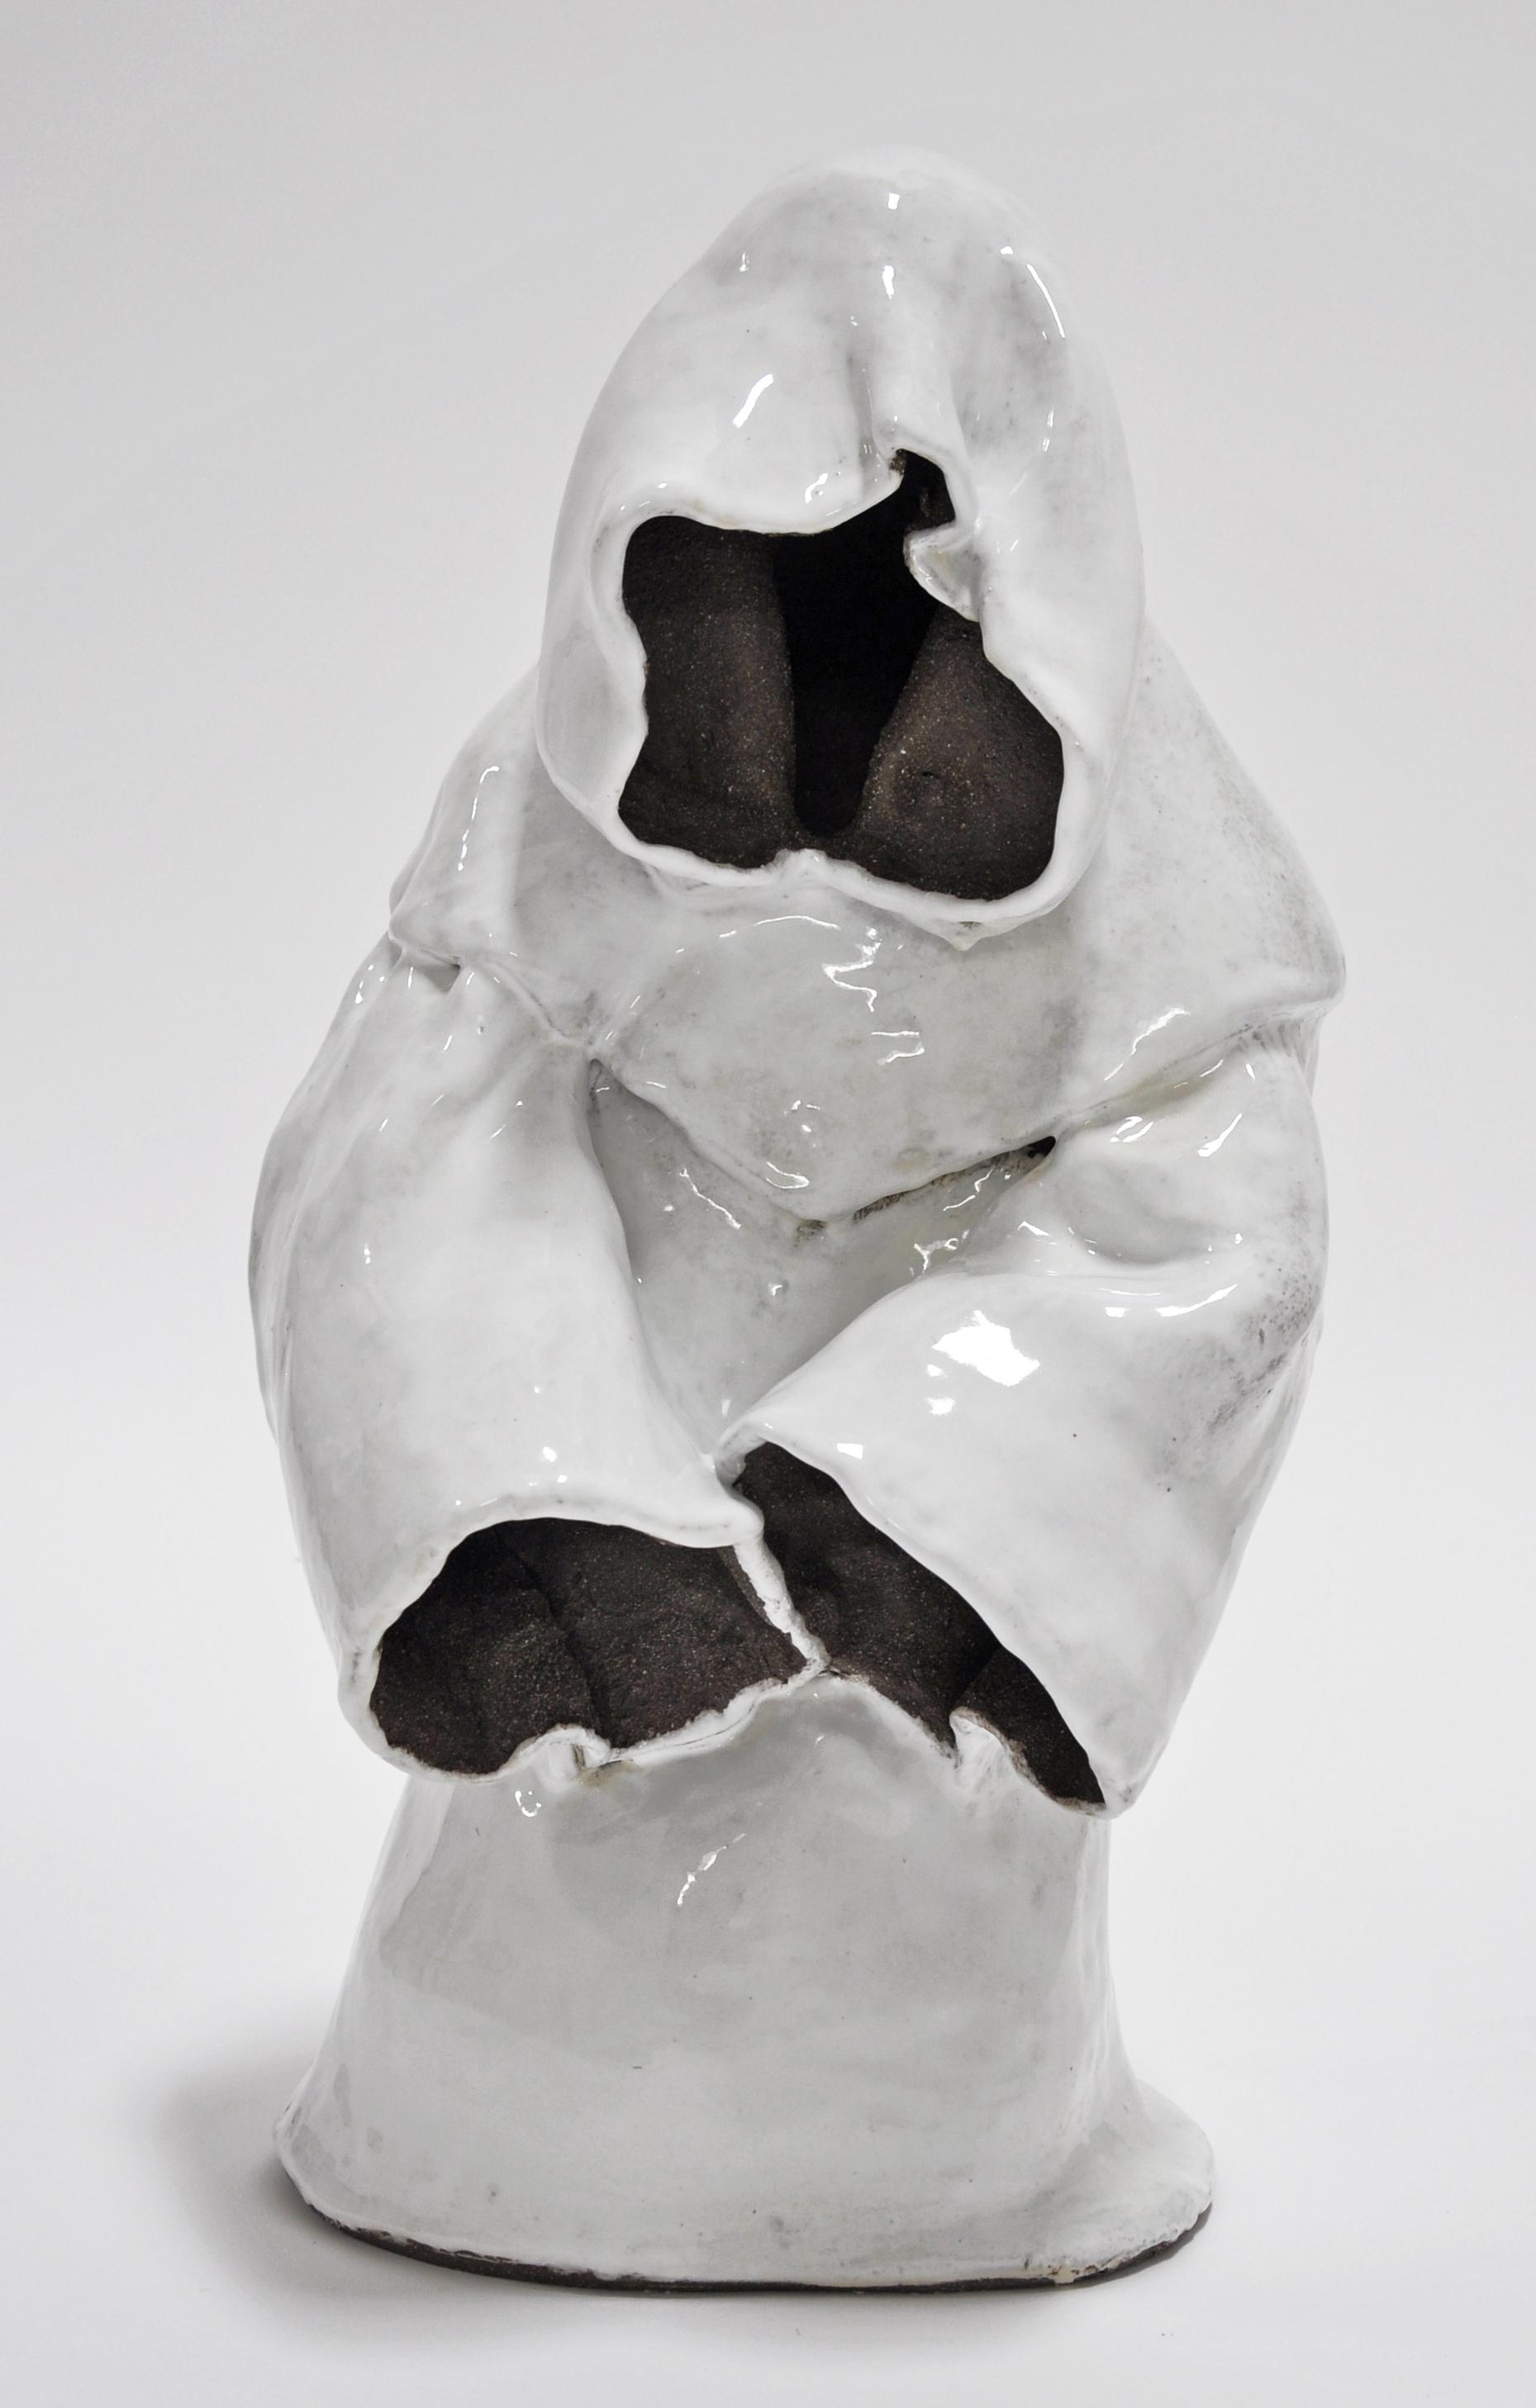 Nick Makanna, Mourner IV, 19 x 9 x 10 in, Glazed ceramic, 2019